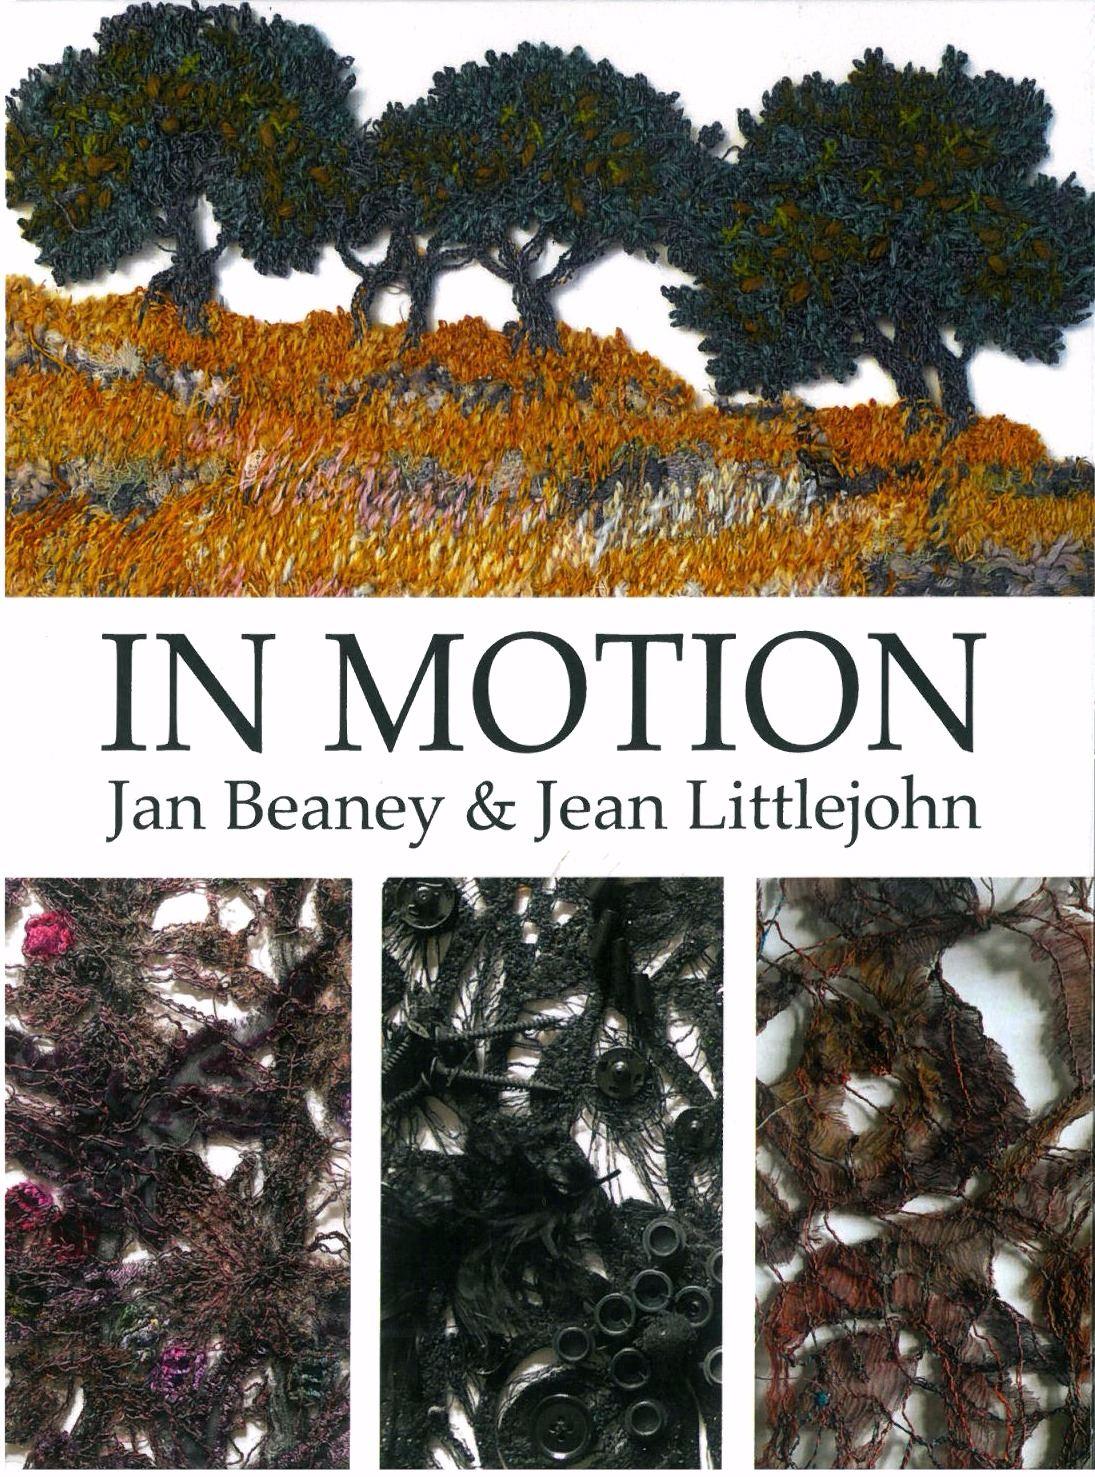 IN MOTION DVD By Jan Beaney and Jean Littlejohn